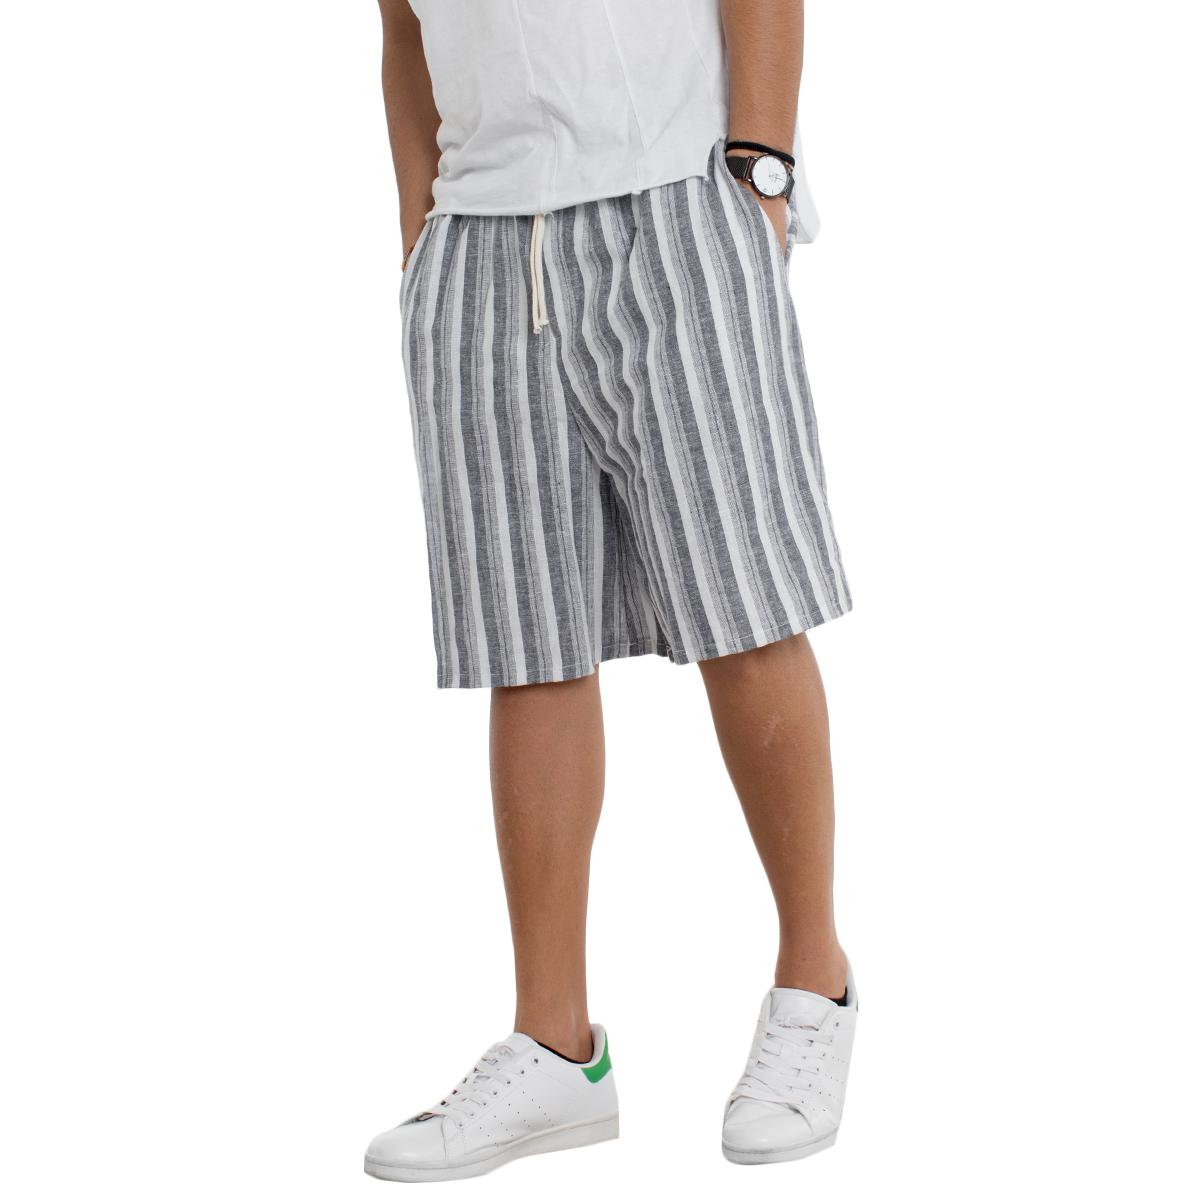 Bermuda Gris Pantalon Short Giosal Élastique IY6vb7gfy